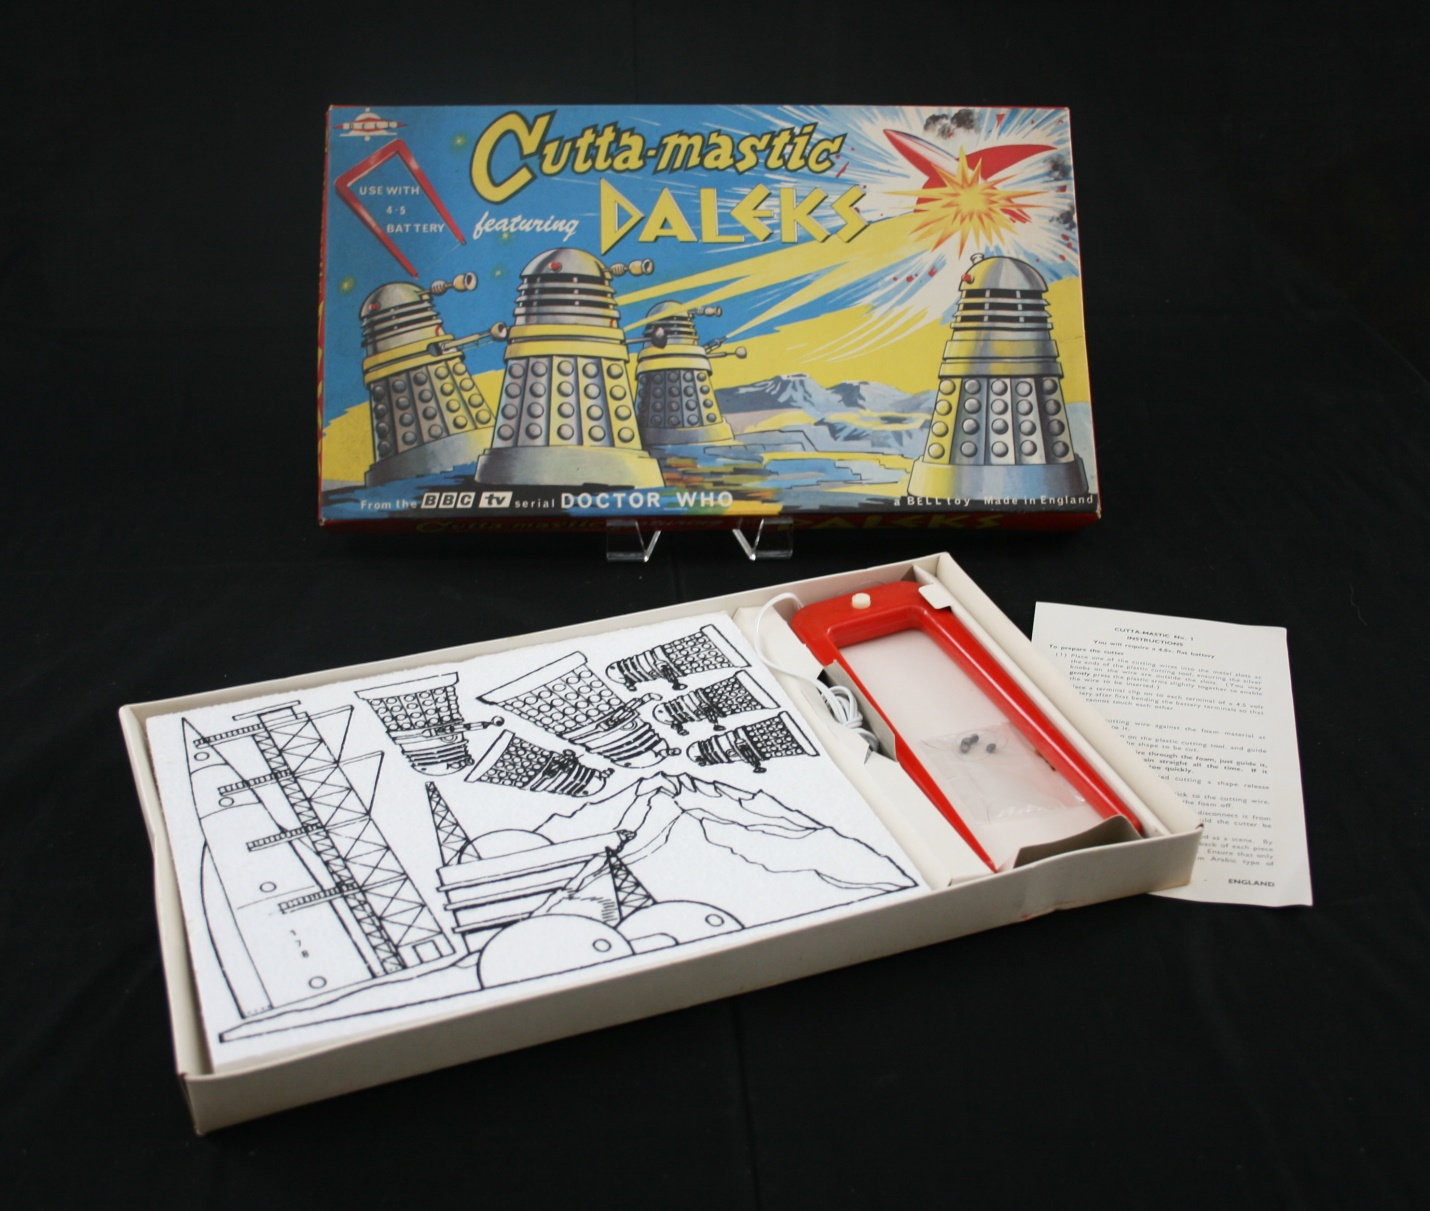 Bell Toys Ltd. small Cutta-Mastic featuring the Daleks